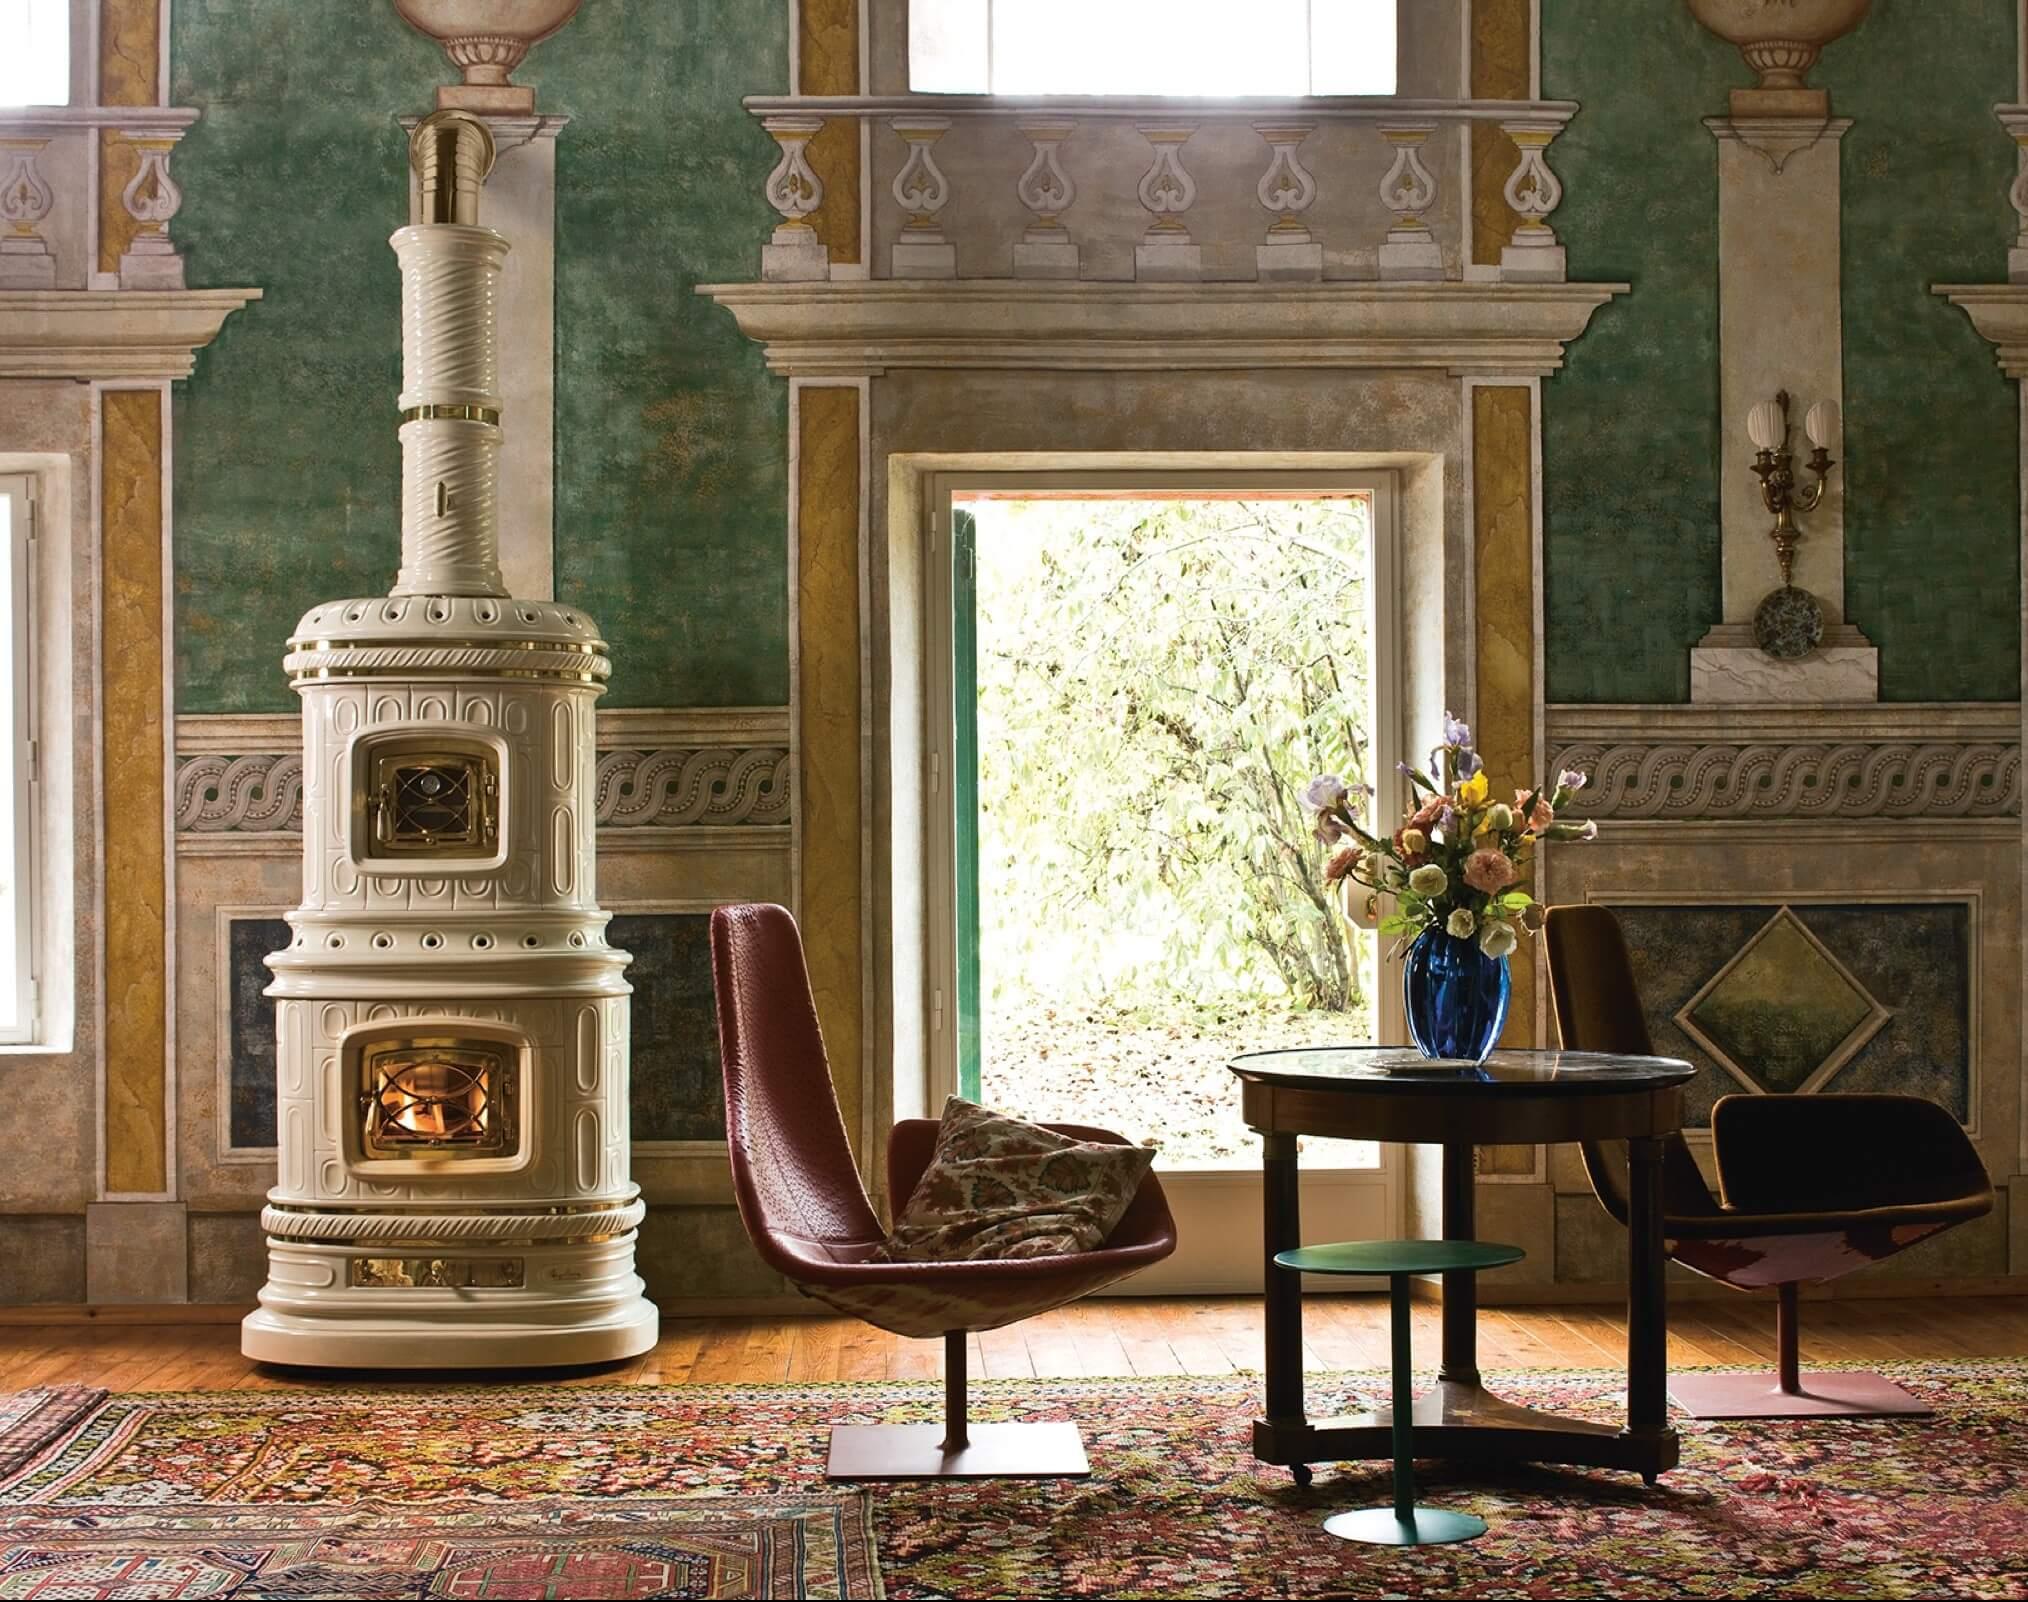 ofen colonna ph nix sch ner leben. Black Bedroom Furniture Sets. Home Design Ideas